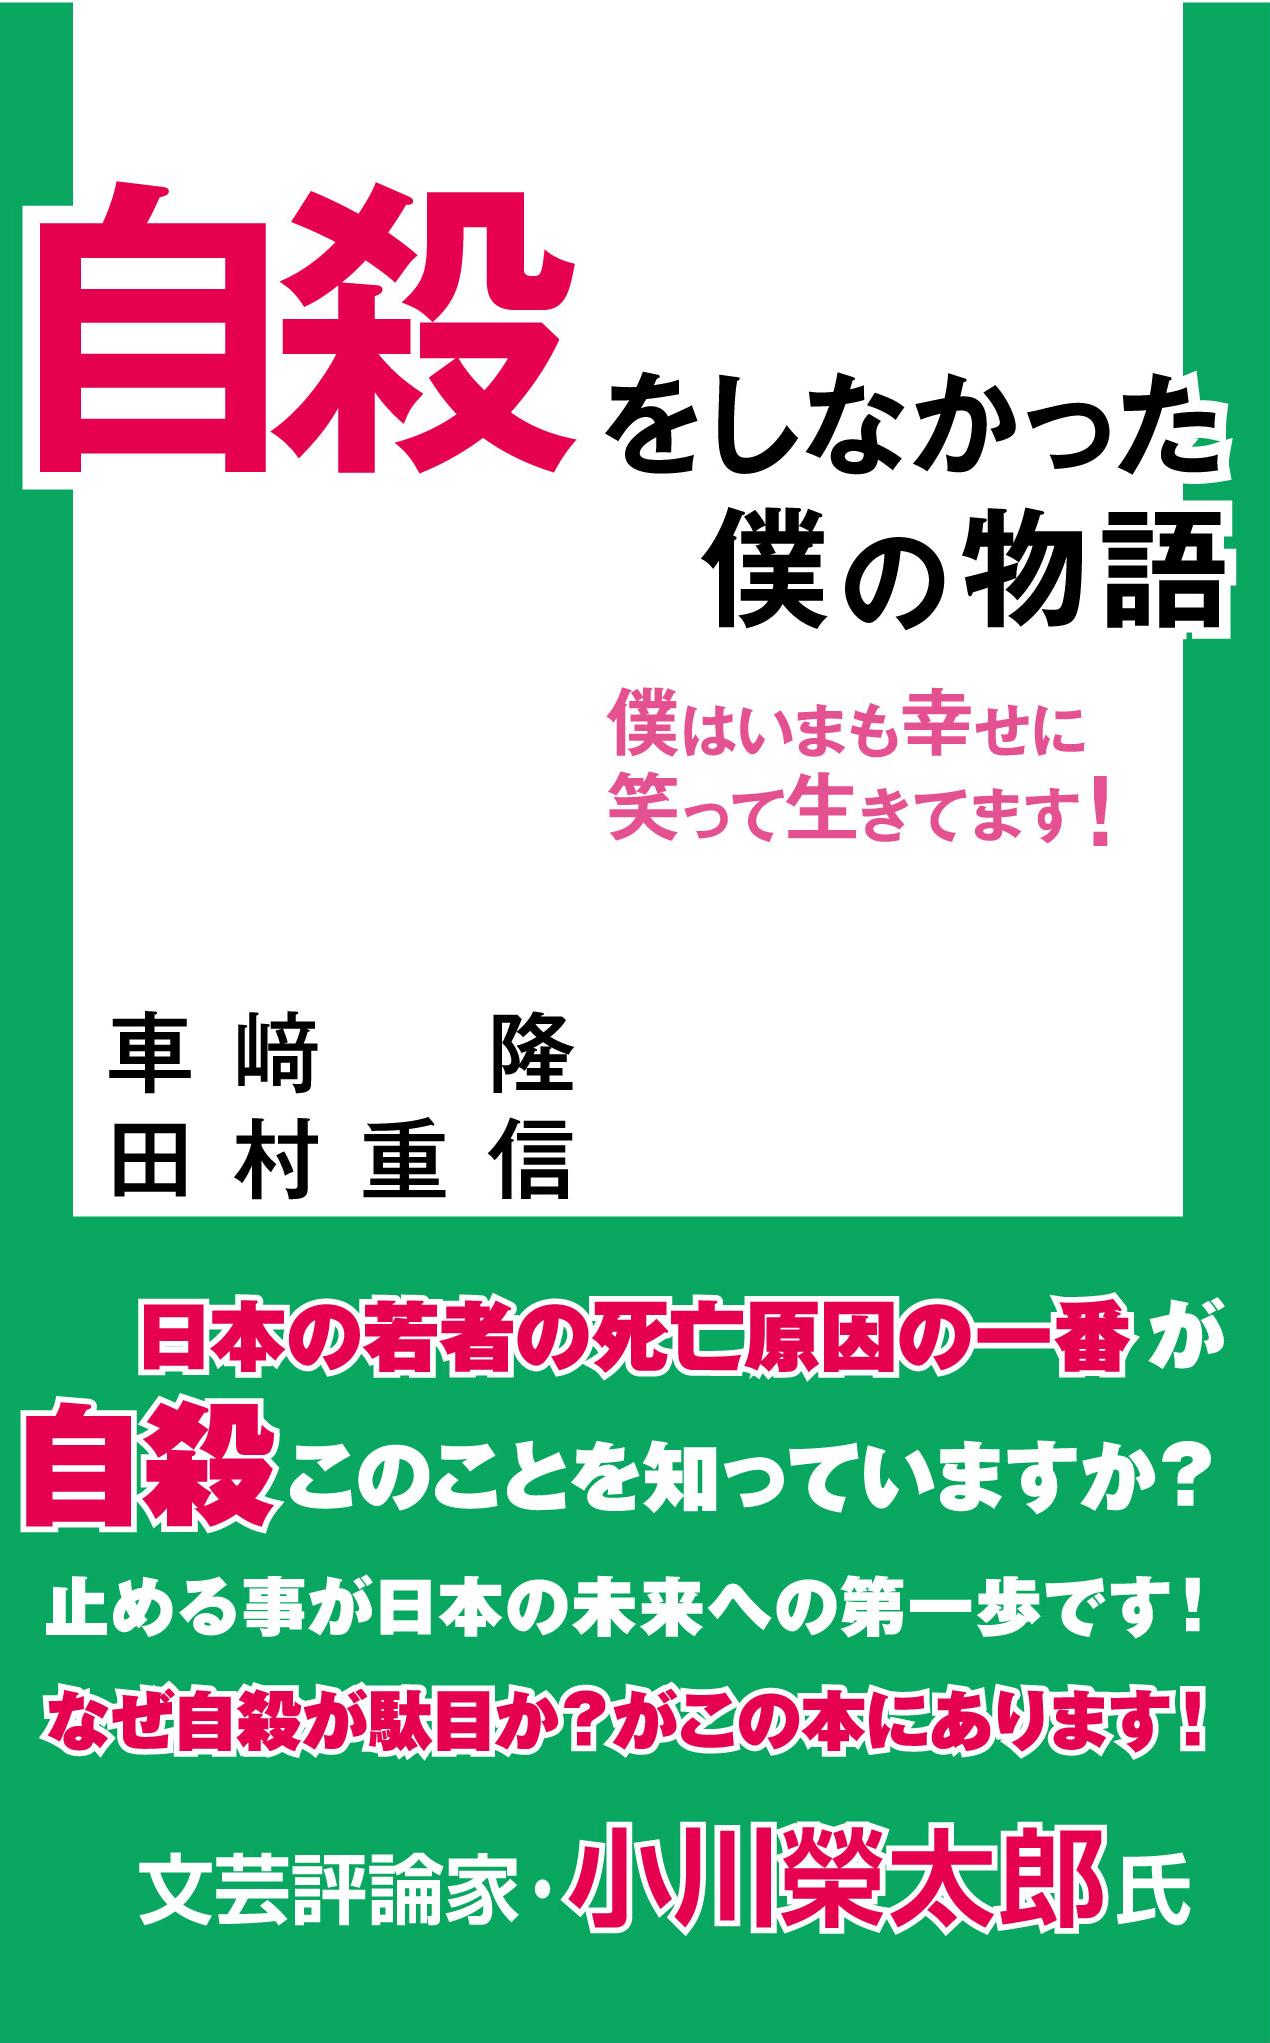 http://www.naigai-group.co.jp/books-img/jisatuwosinakatta.jpg